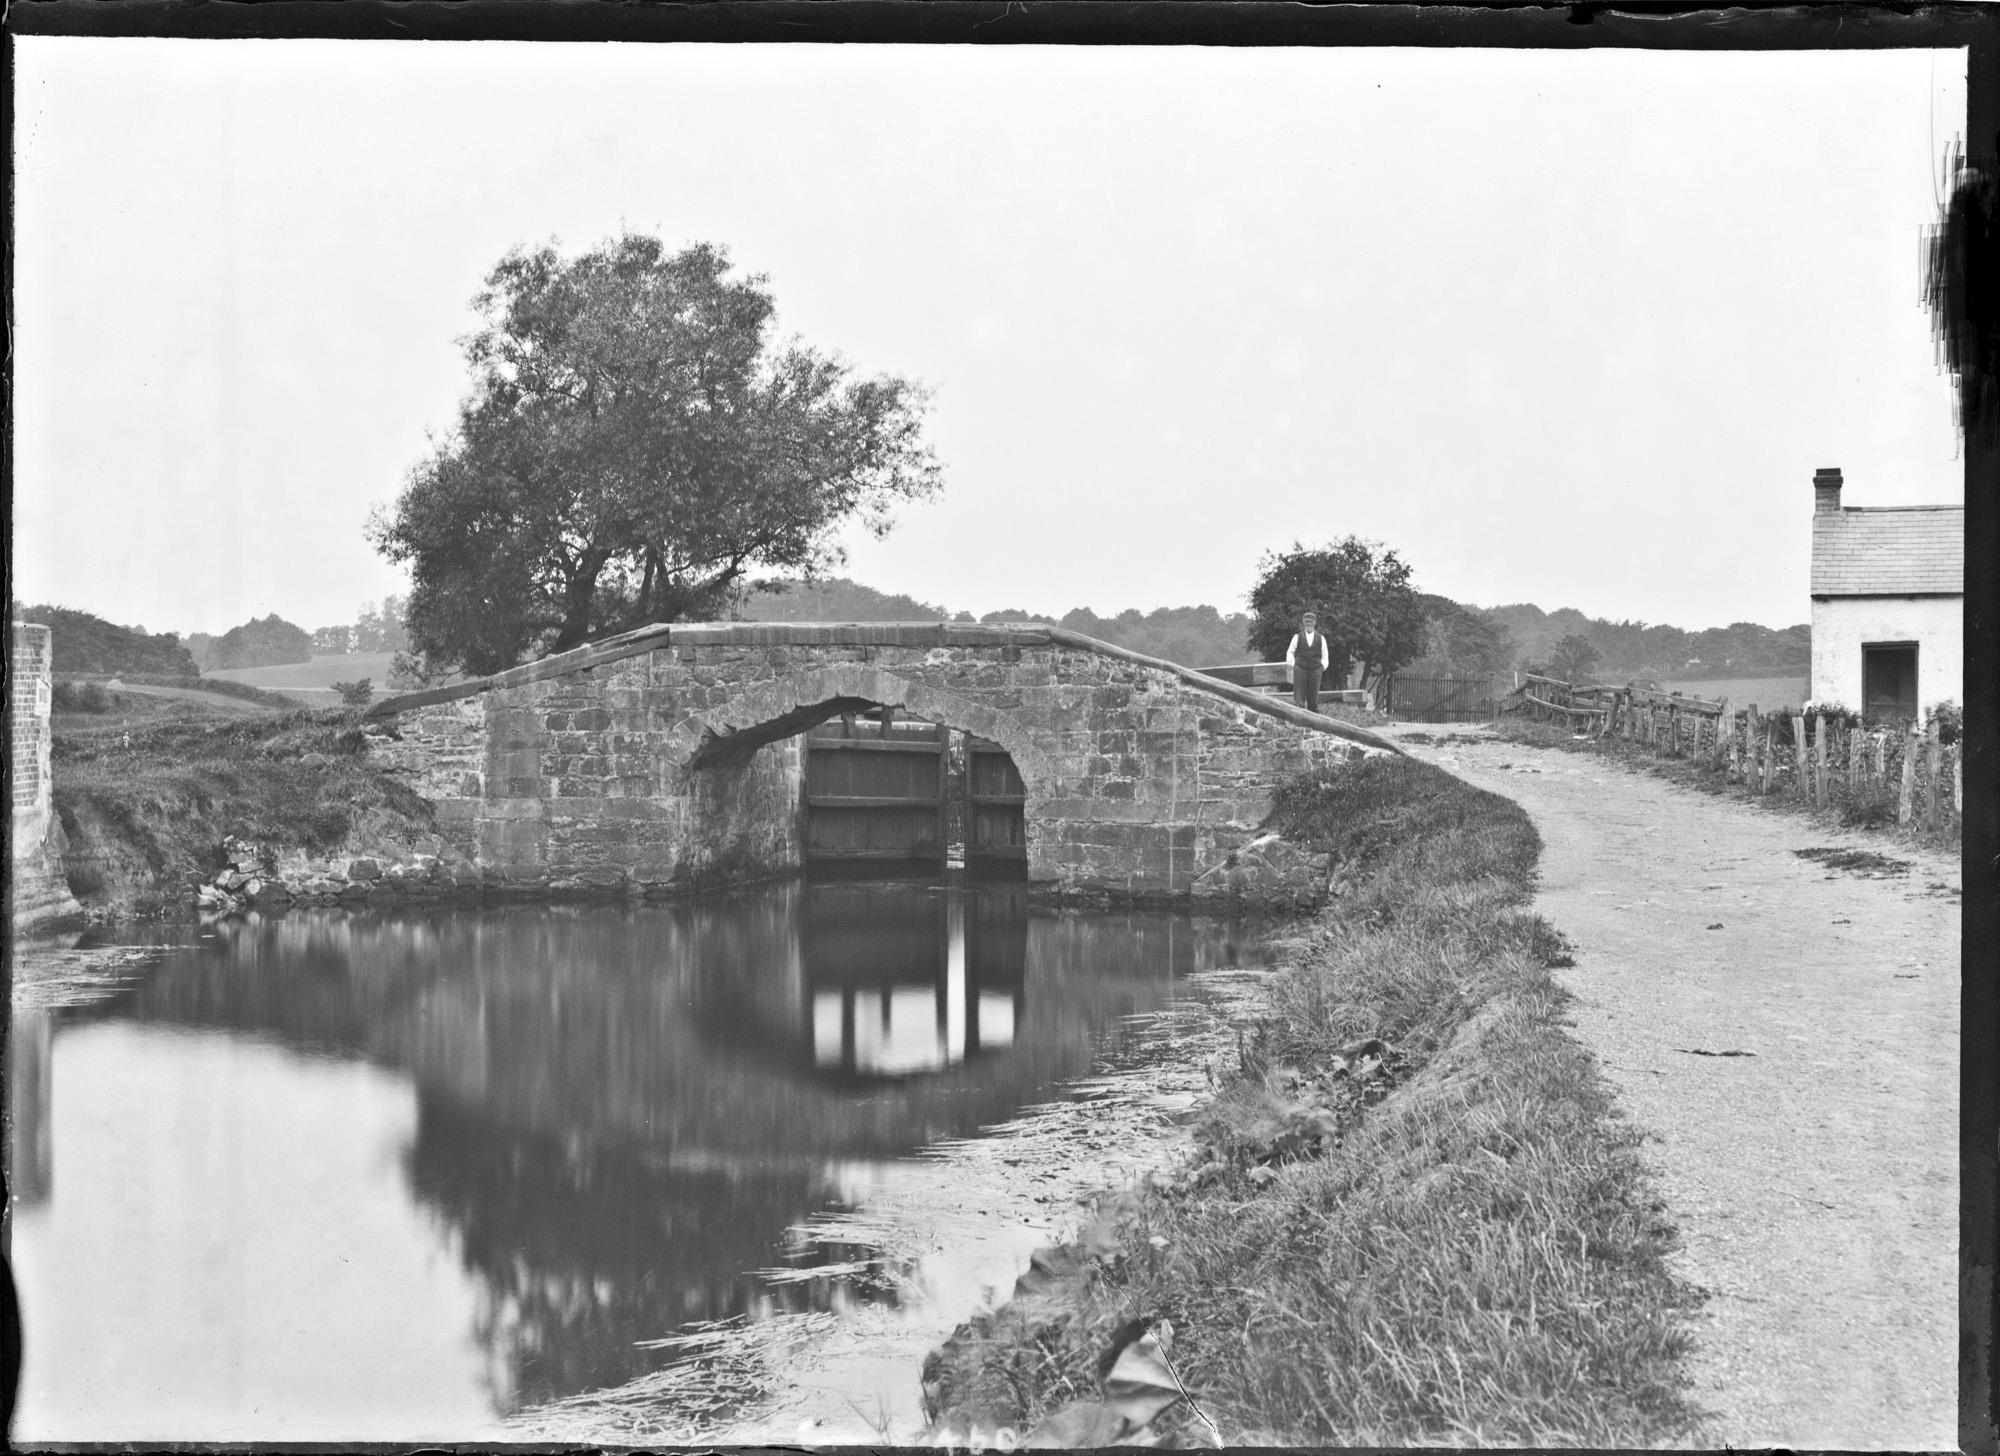 Third Lock, River Lagan, Belfast, Co. Antrim